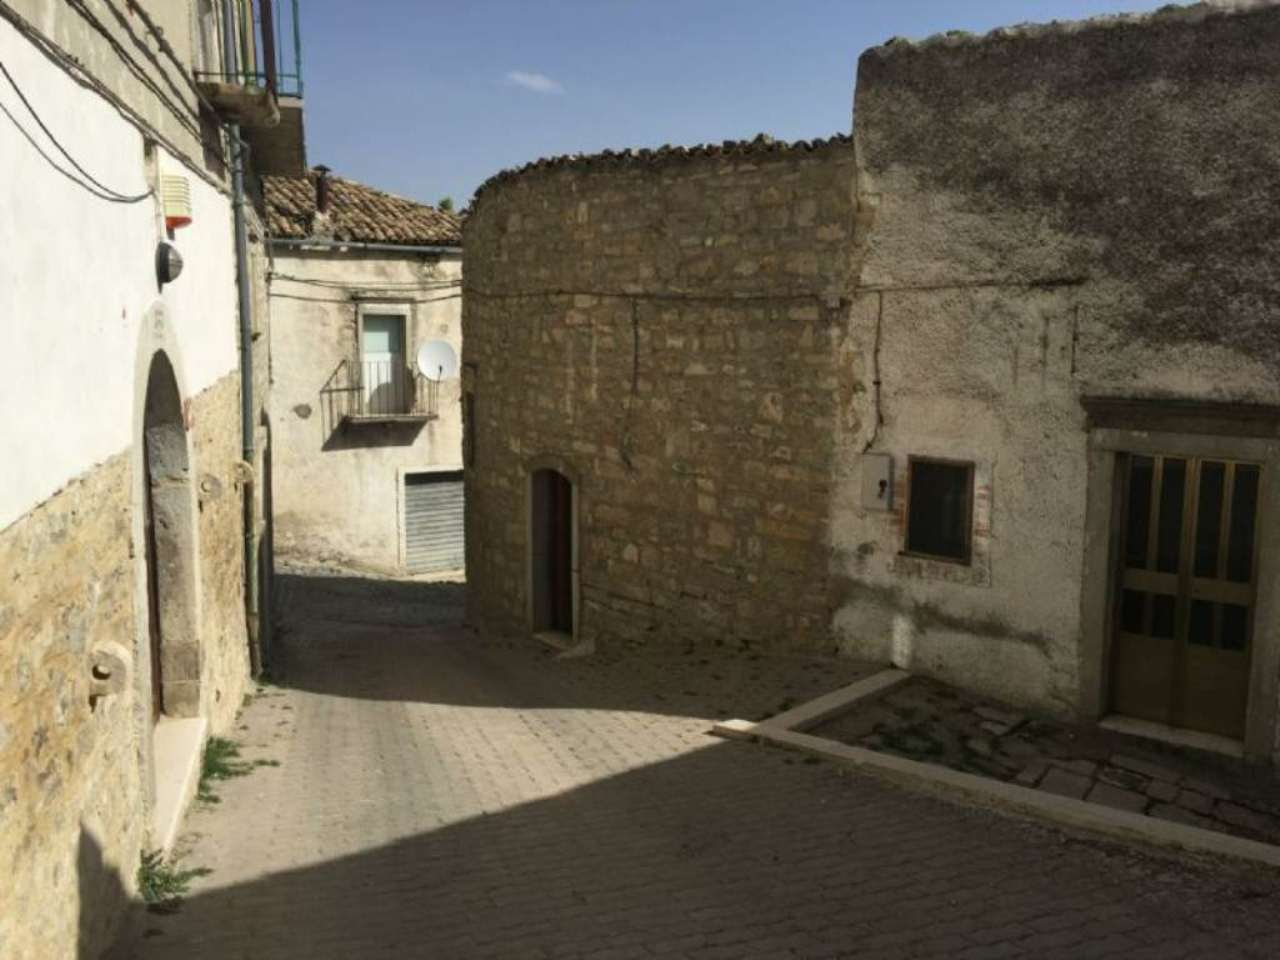 Bilocale Alberona Via Trento Trieste 1